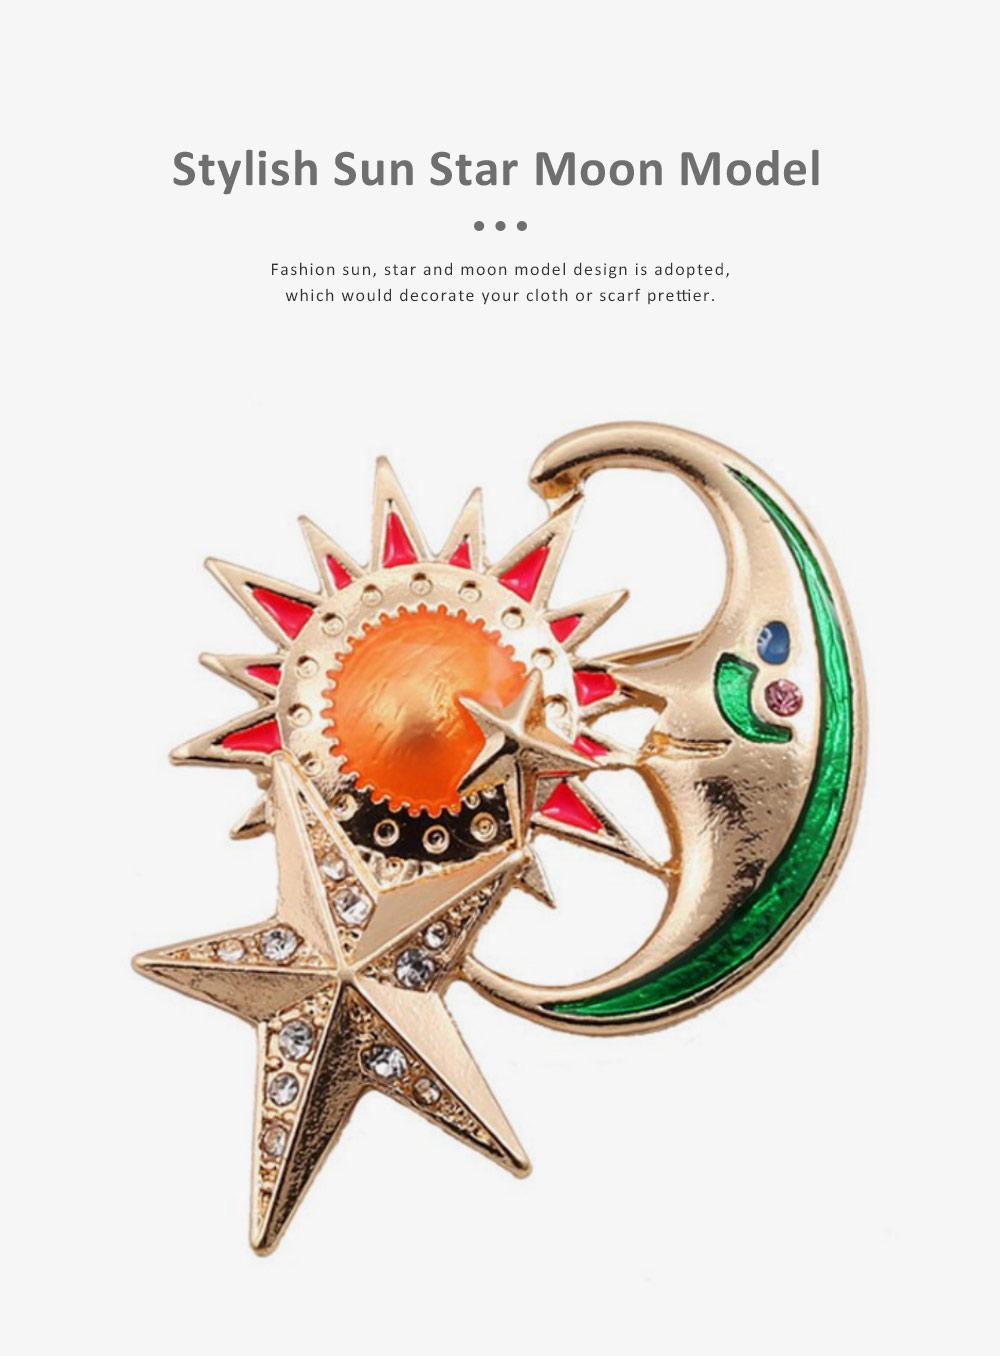 Sun Star Moon Breastpin, Fancy Delicate Shiny Alloy Brooch Scarf Ornament Oil-spot Glaze Rhinestone Decoration Brooch 4